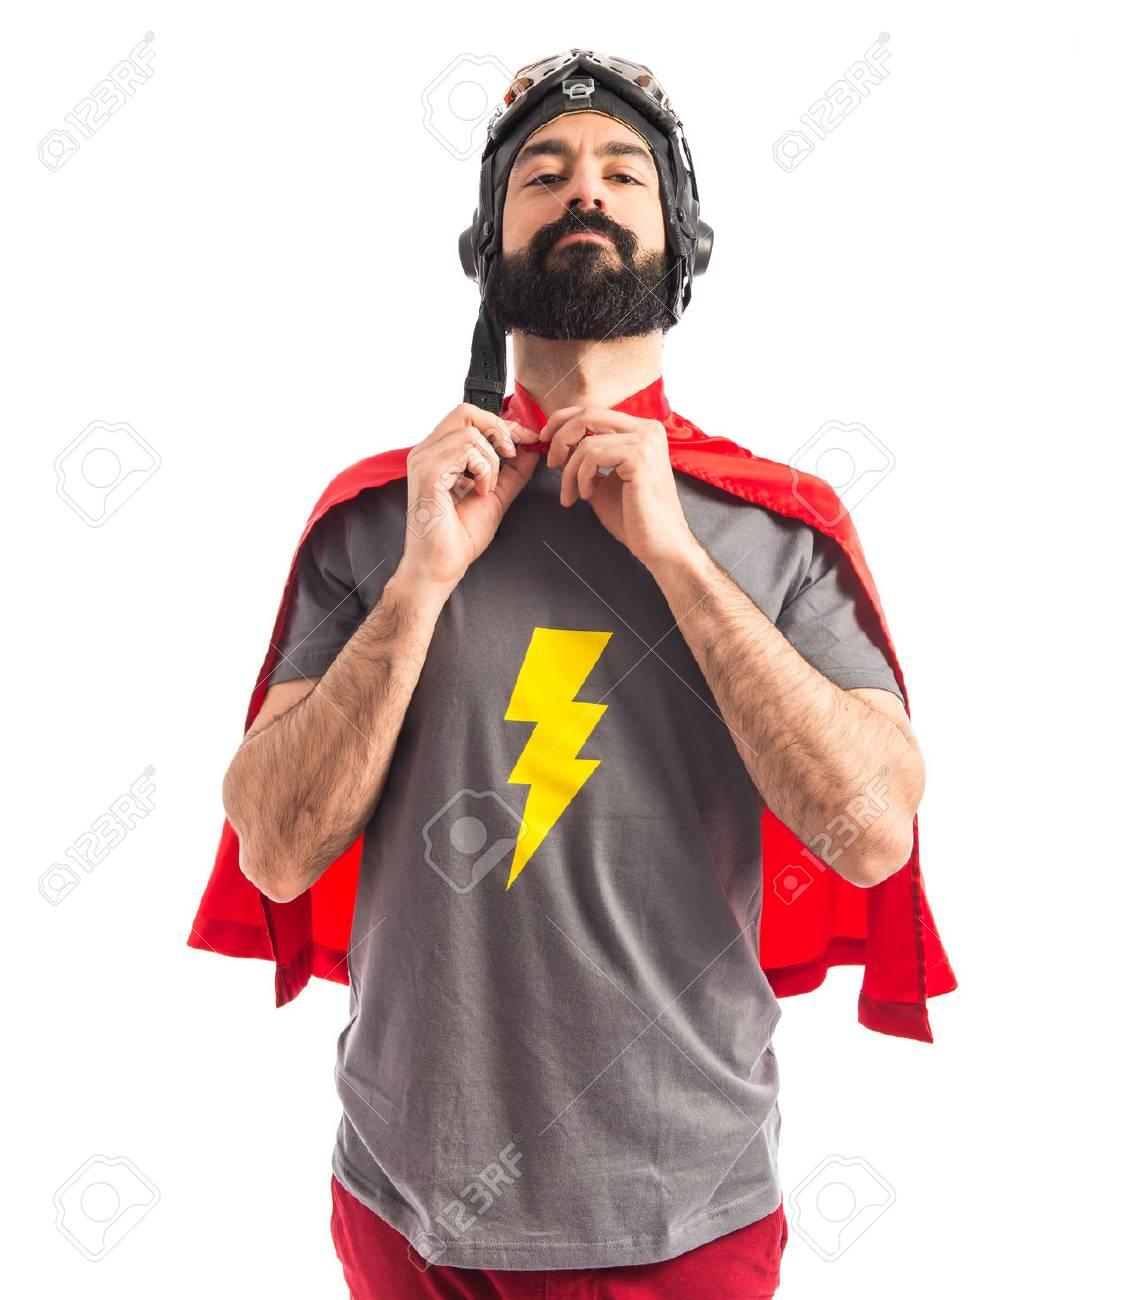 Superhero over white background - 40412317